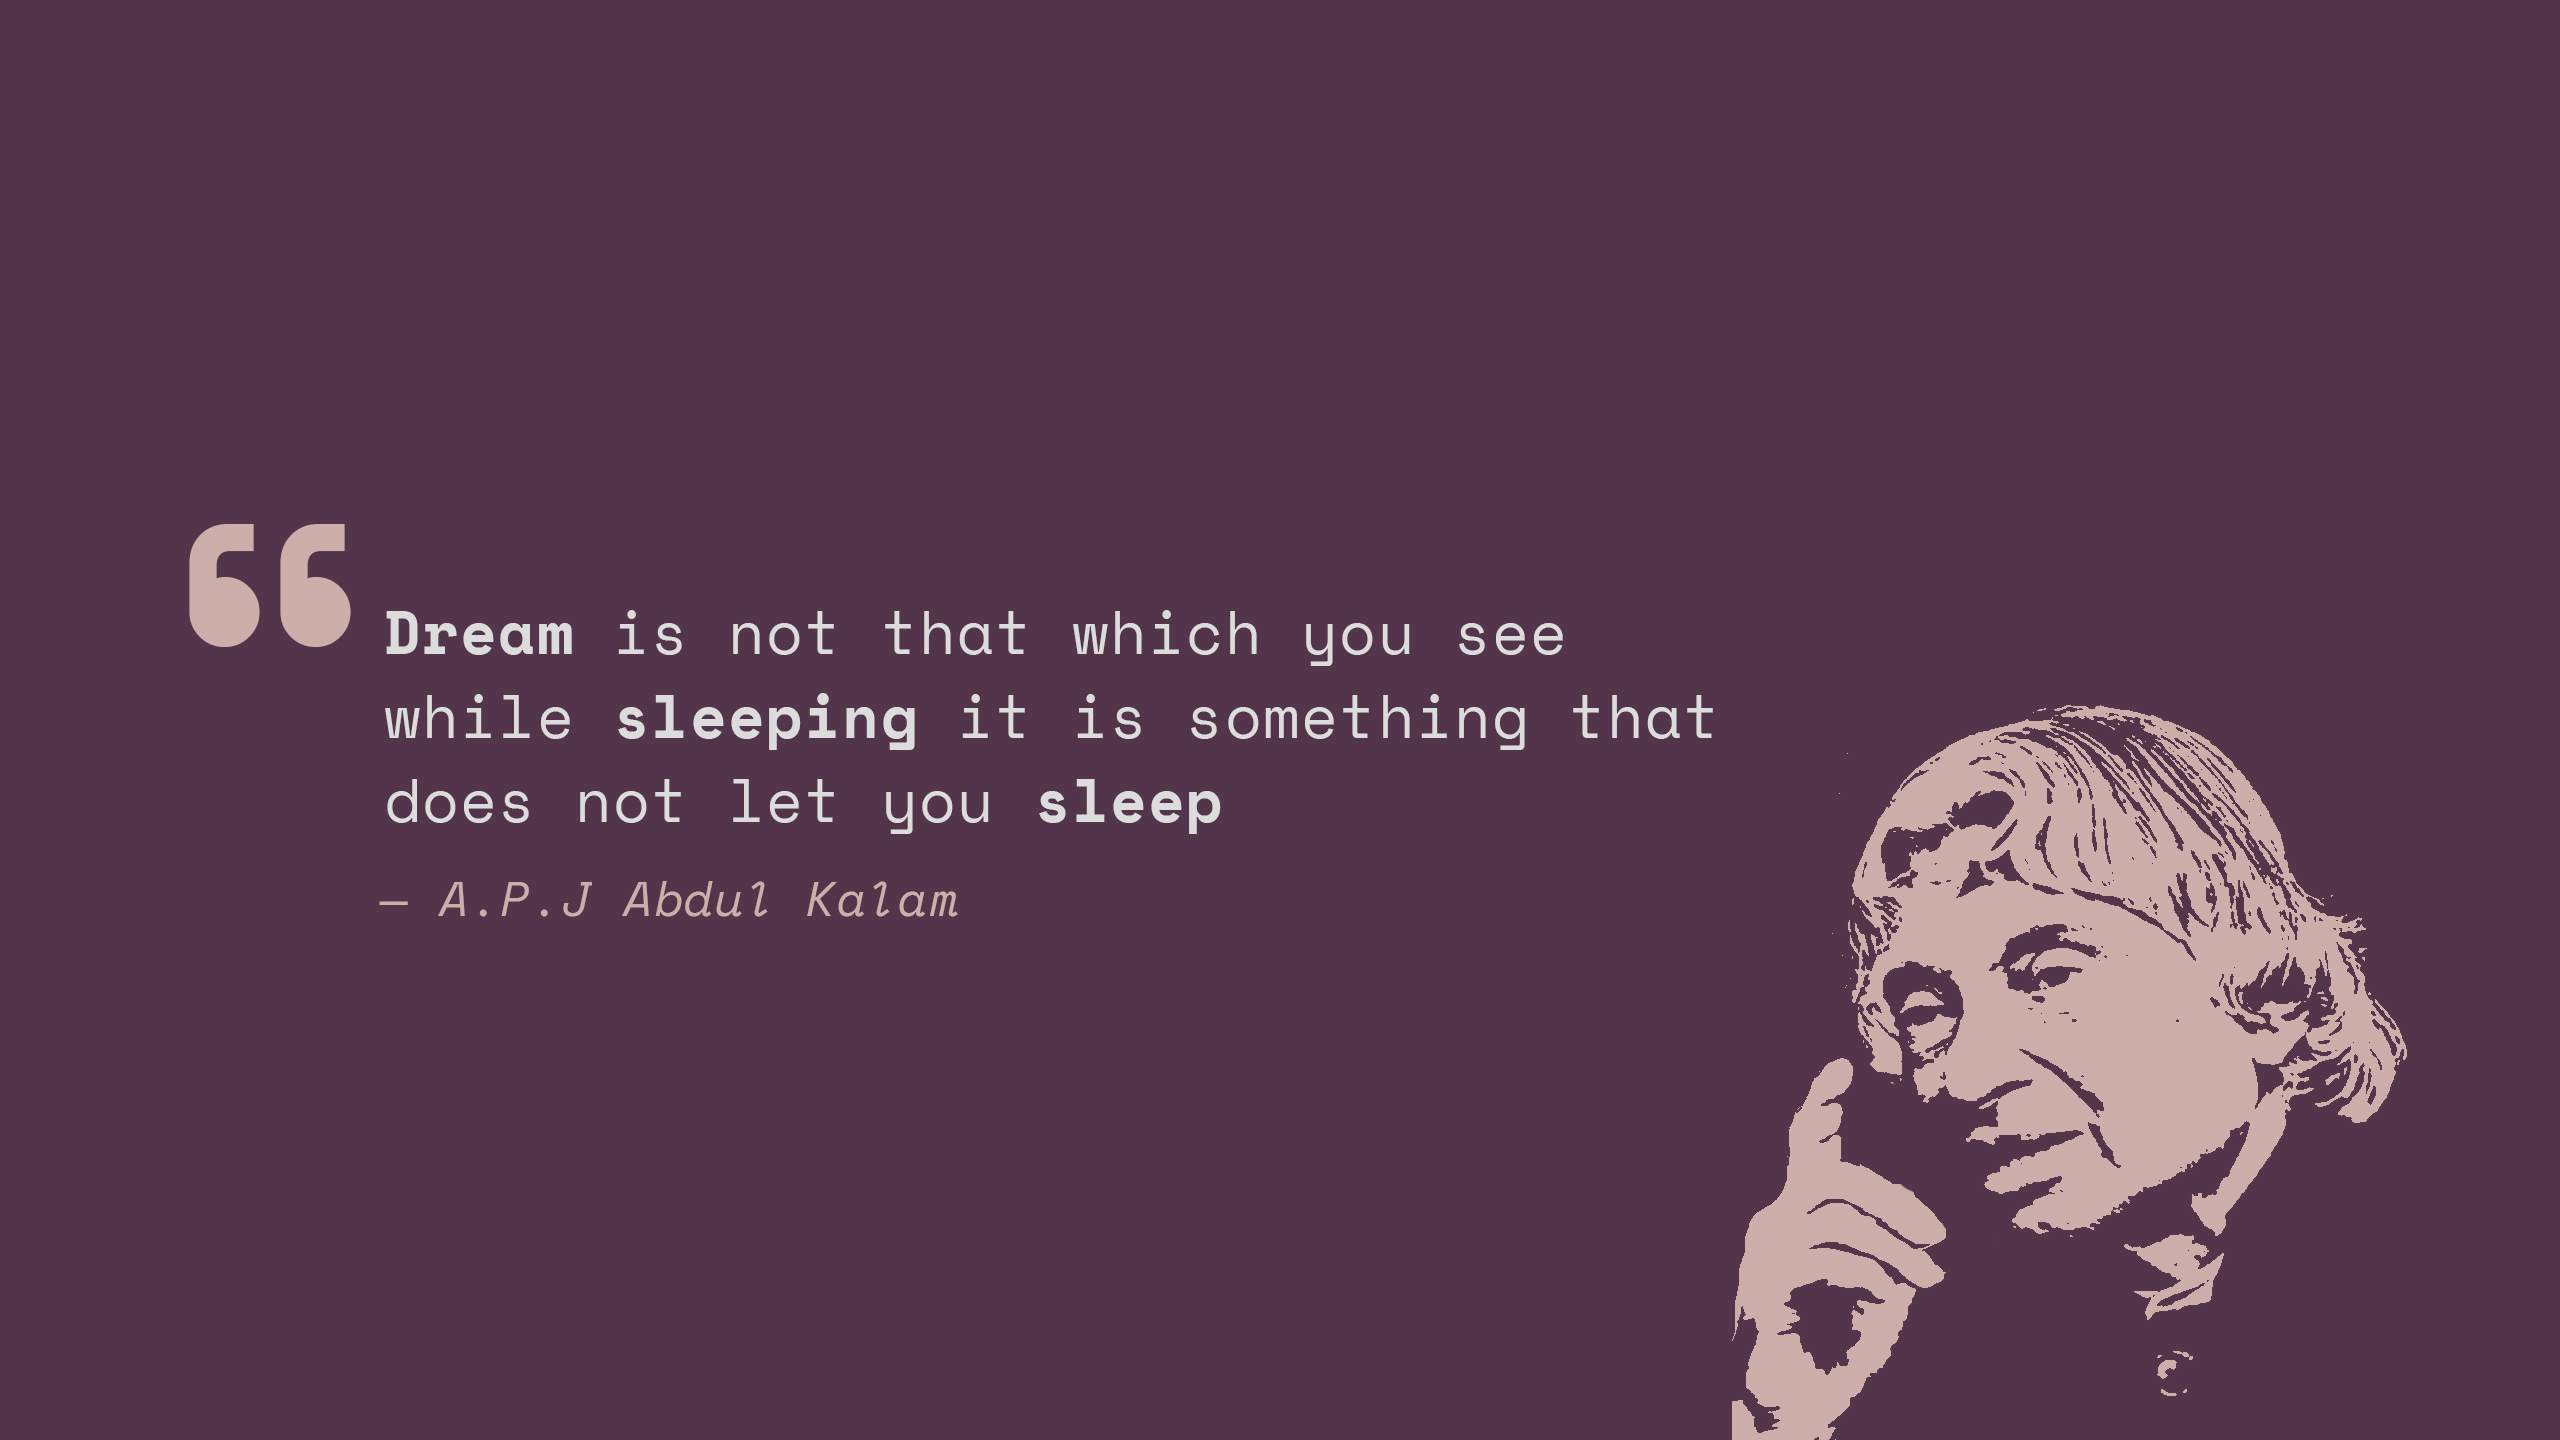 Dream, Sleep, Abdul Kalam, Popular Quotes, HD, Typography